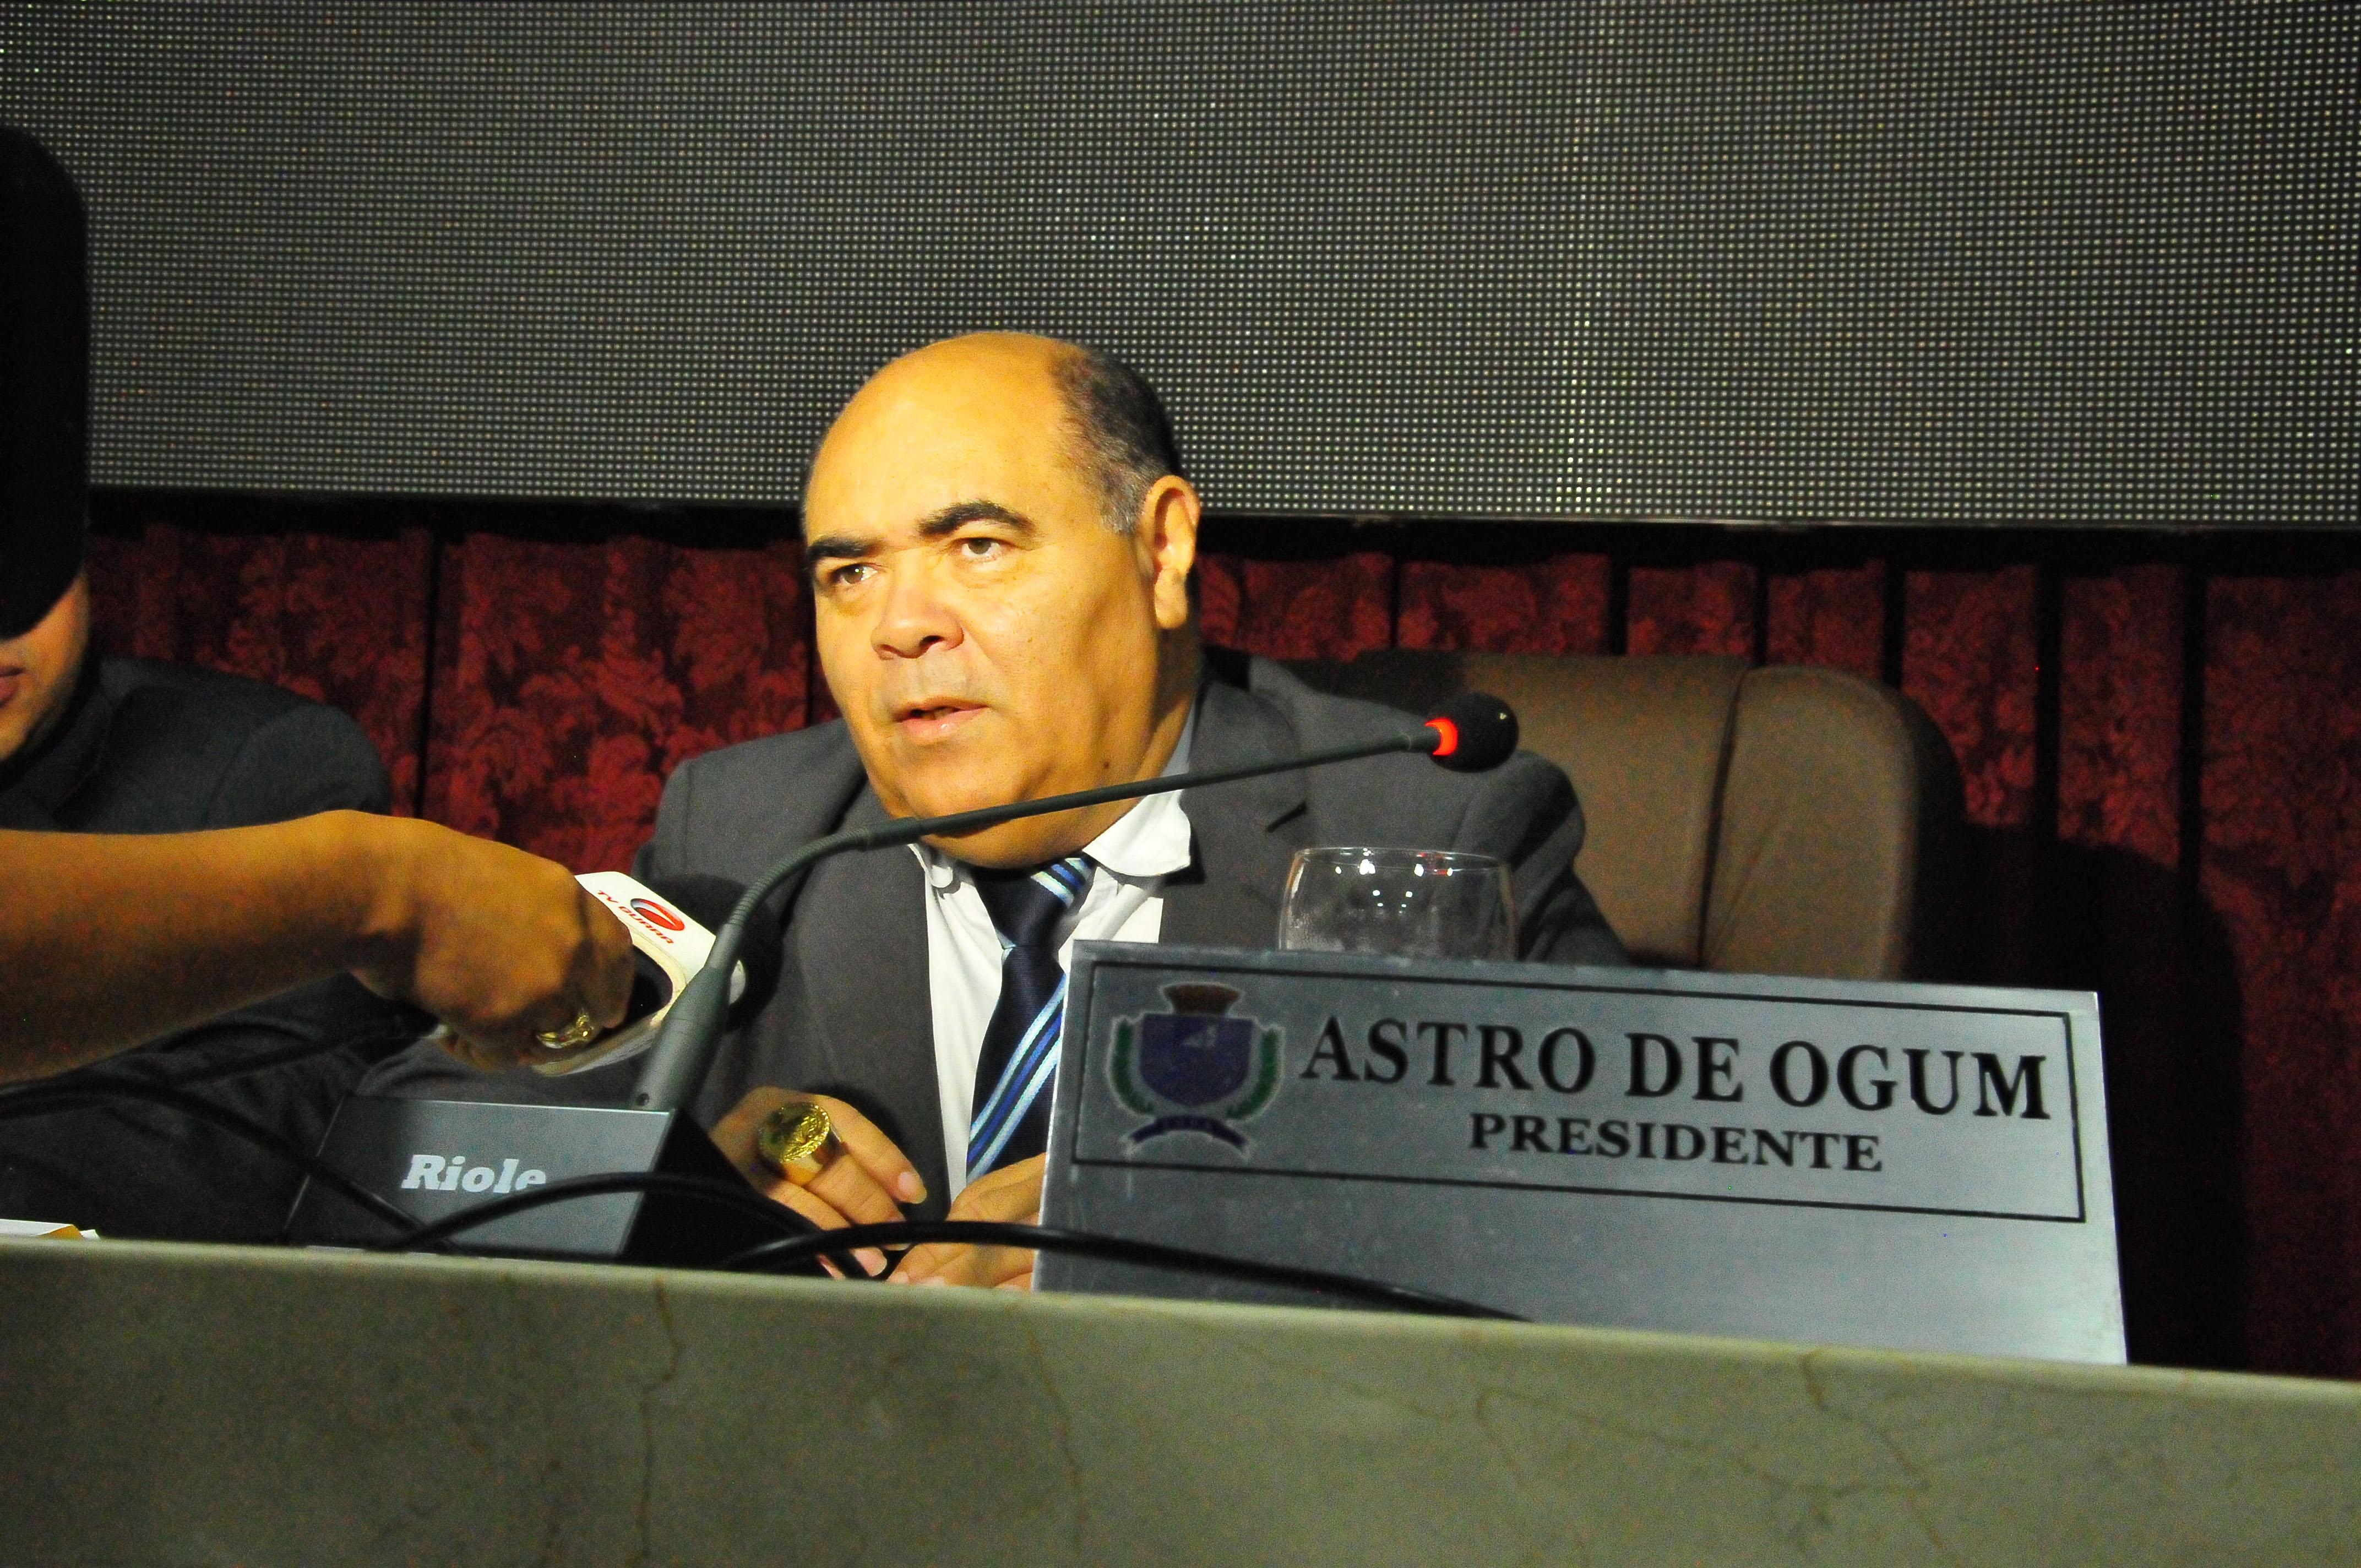 Presidente Astro deOgum anuncia que Câmara quer cumprimento da lei sobre transporte particular de passageiros.